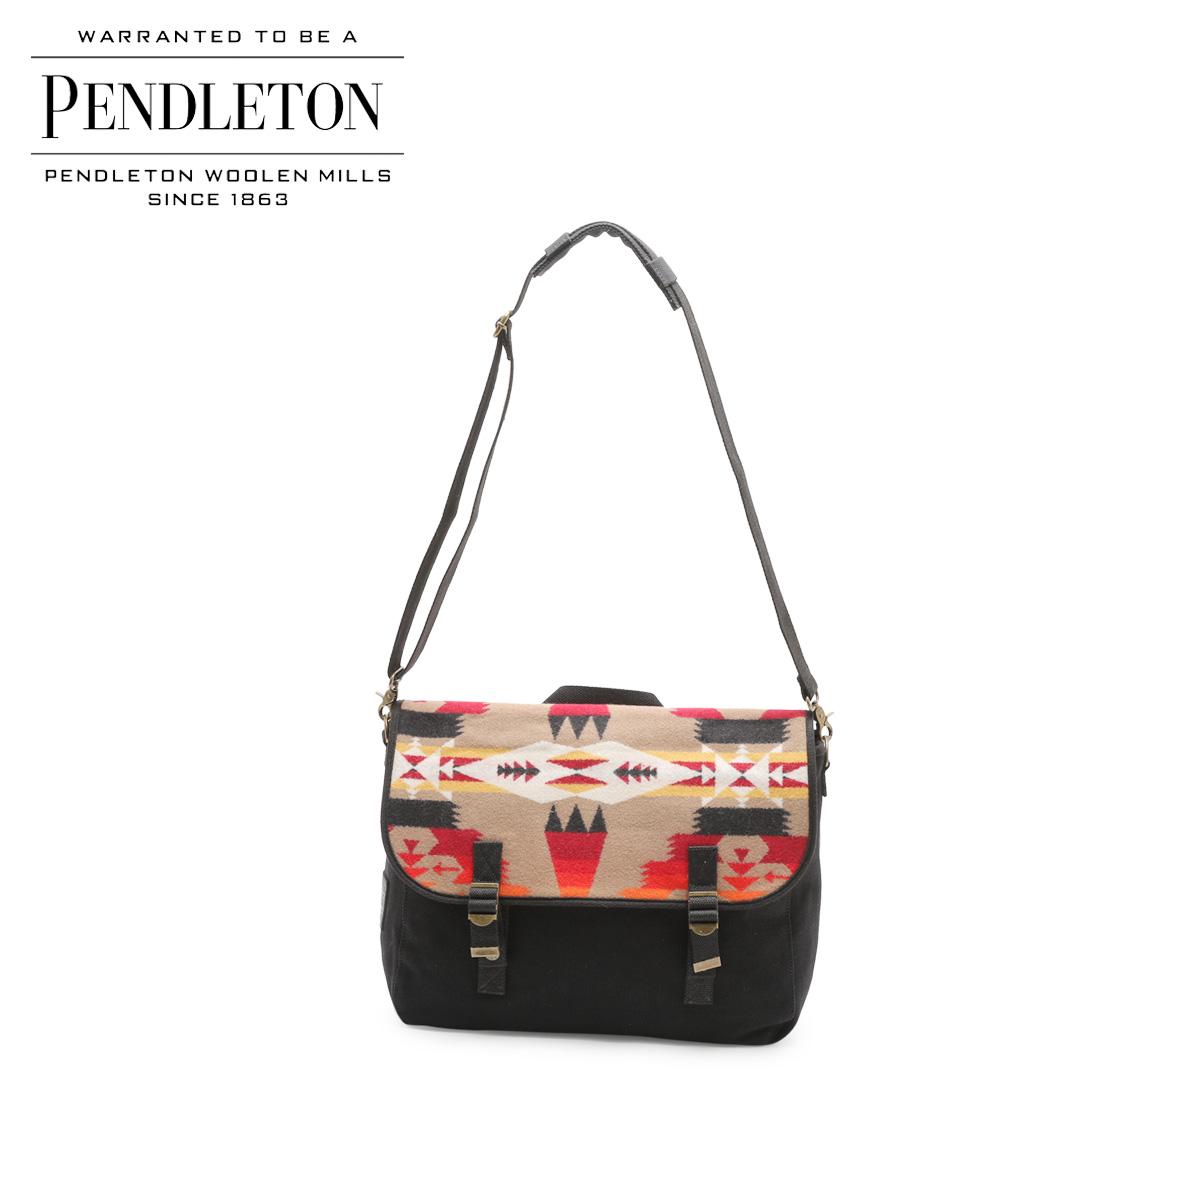 PENDLETON MESSENGER BAG ペンドルトン バッグ メッセンジャーバッグ メンズ レディース カーキ GC828